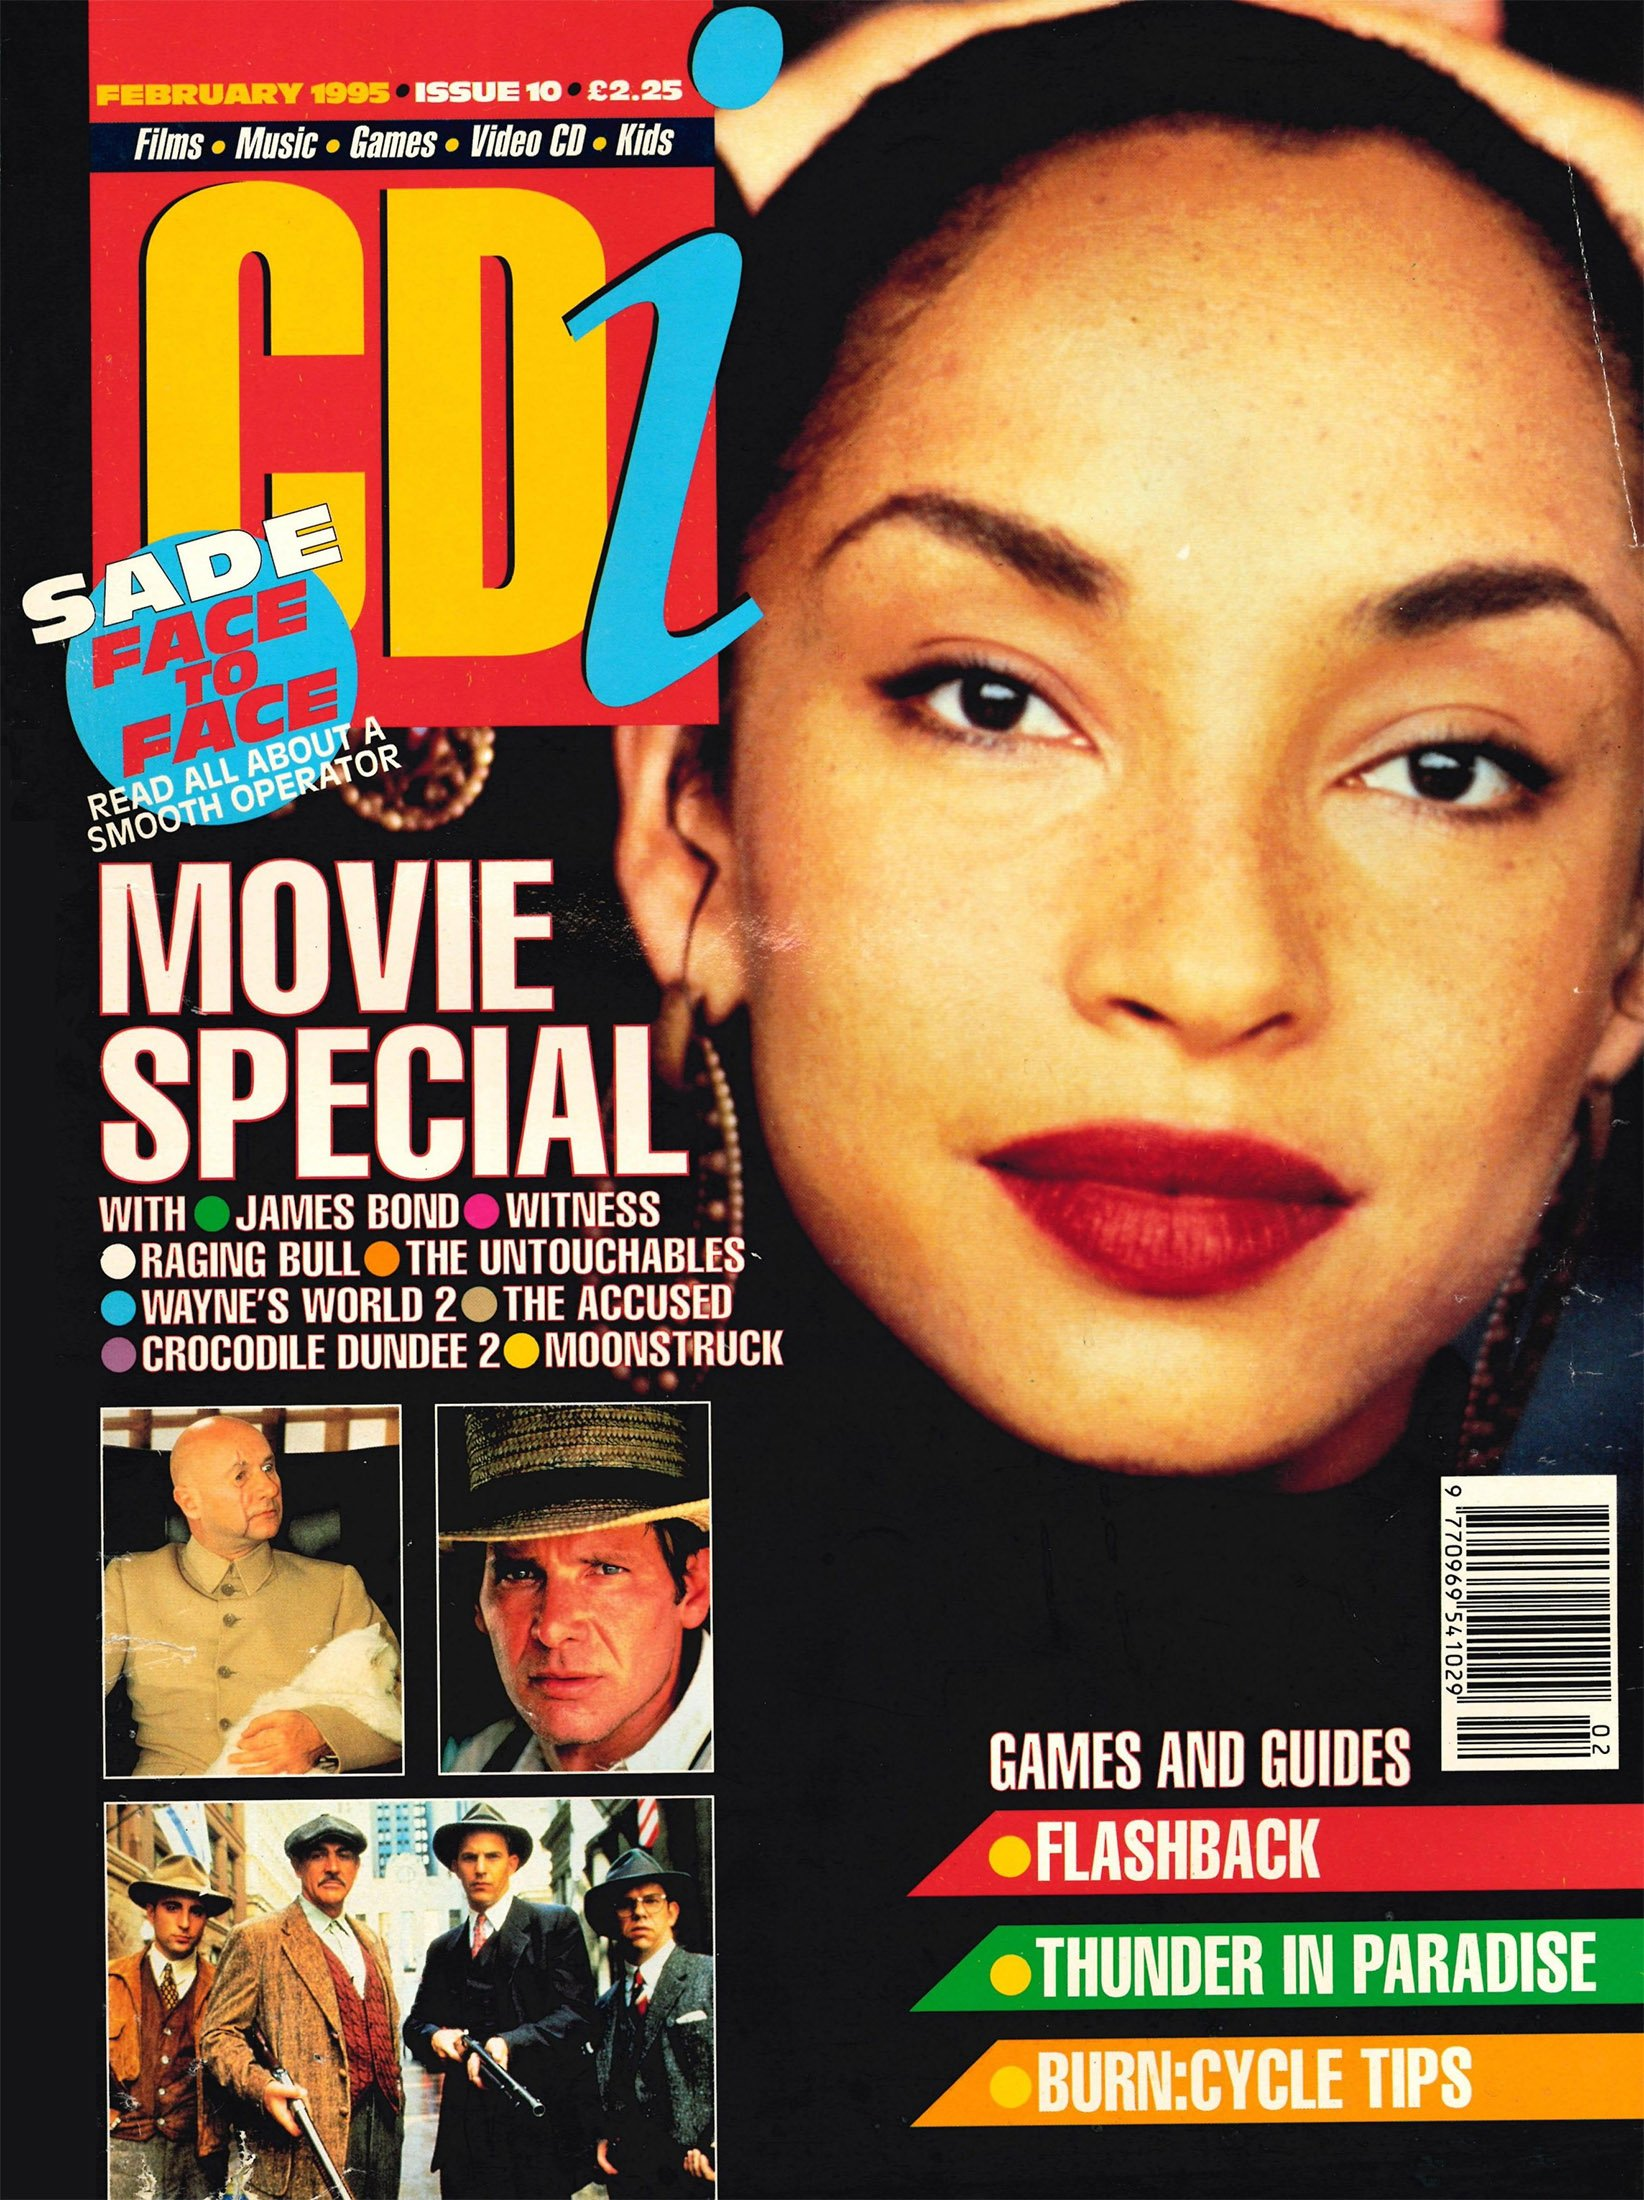 CDi Issue 10 (February 1995)